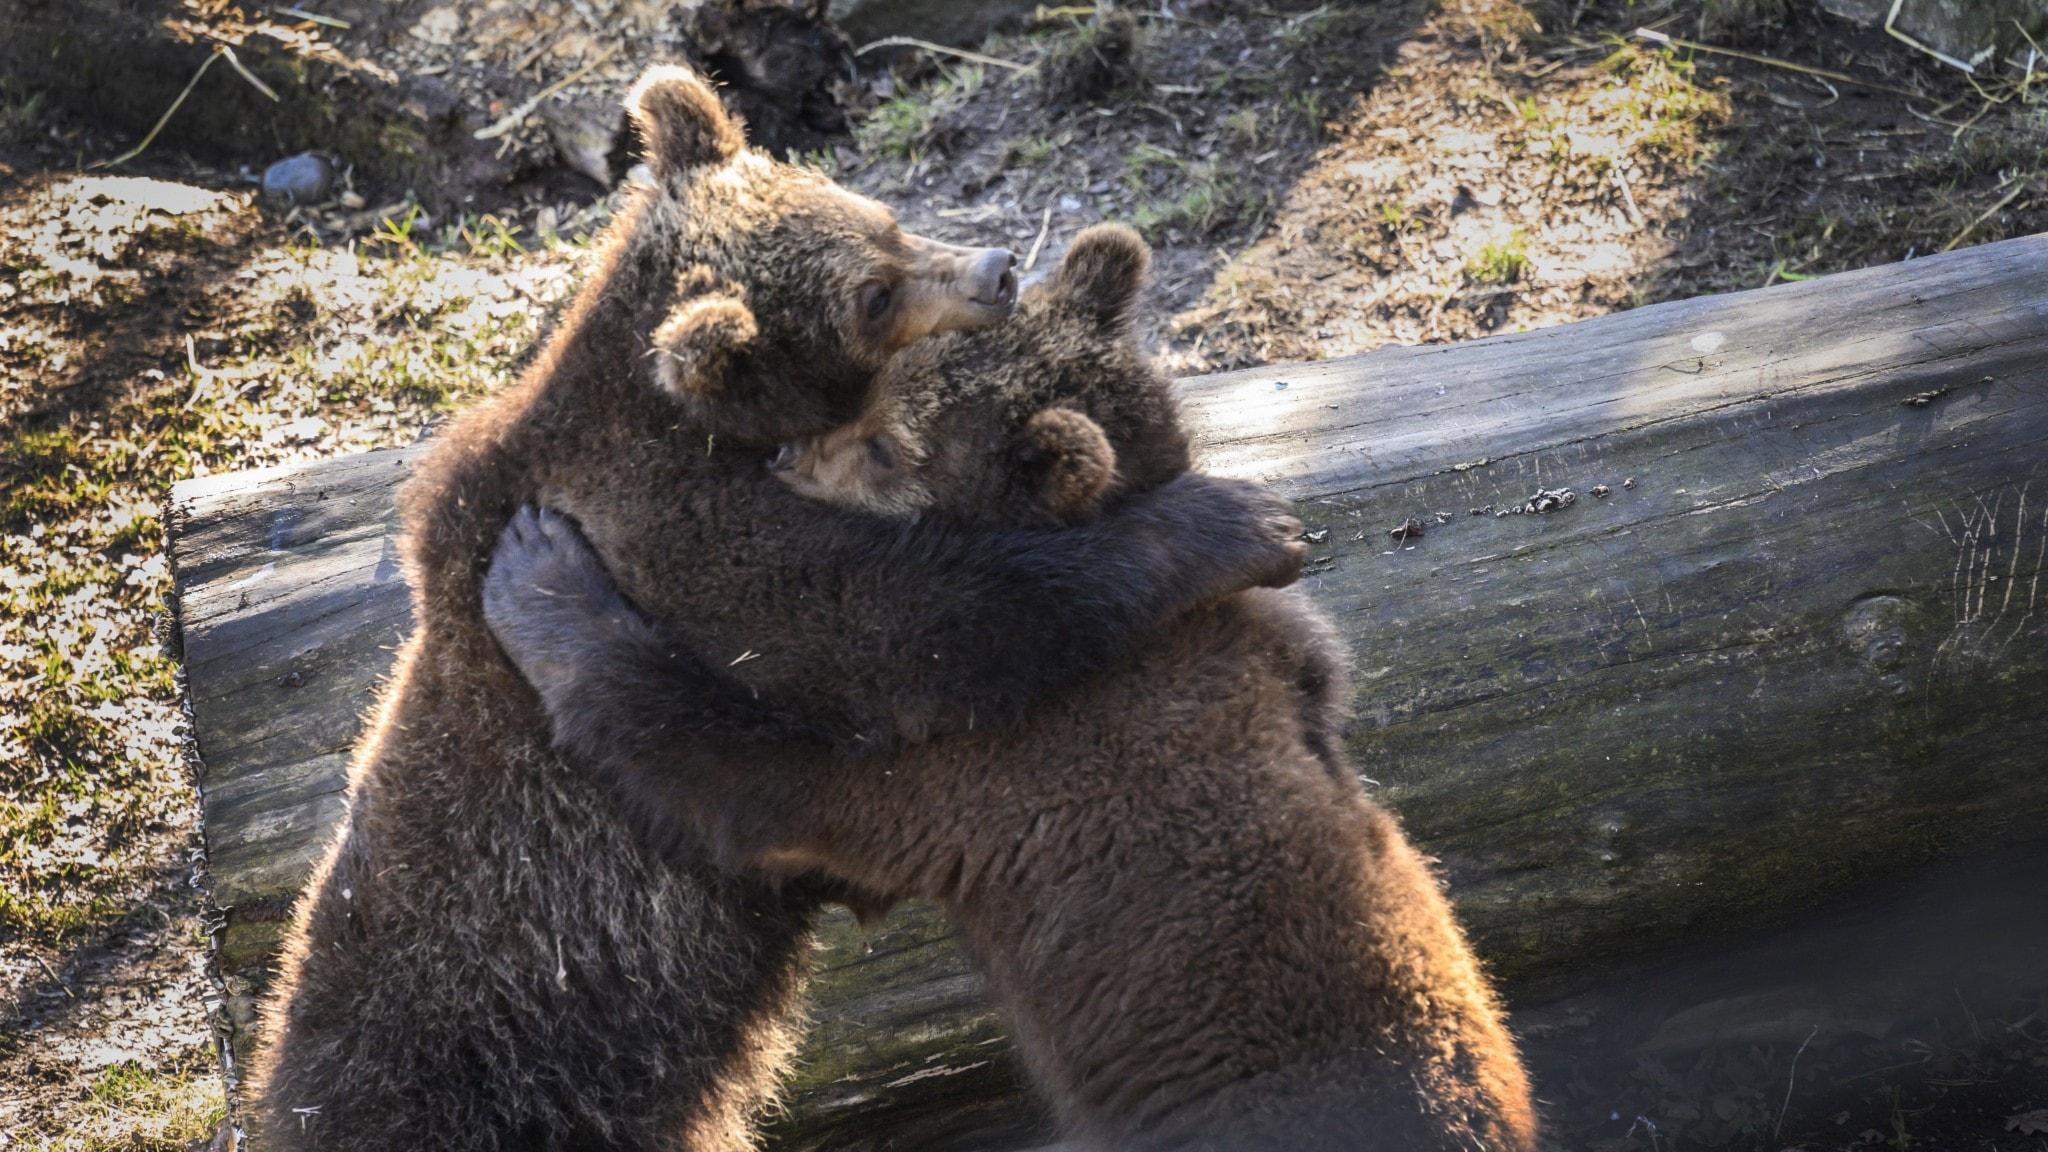 Two bears hugging outside.